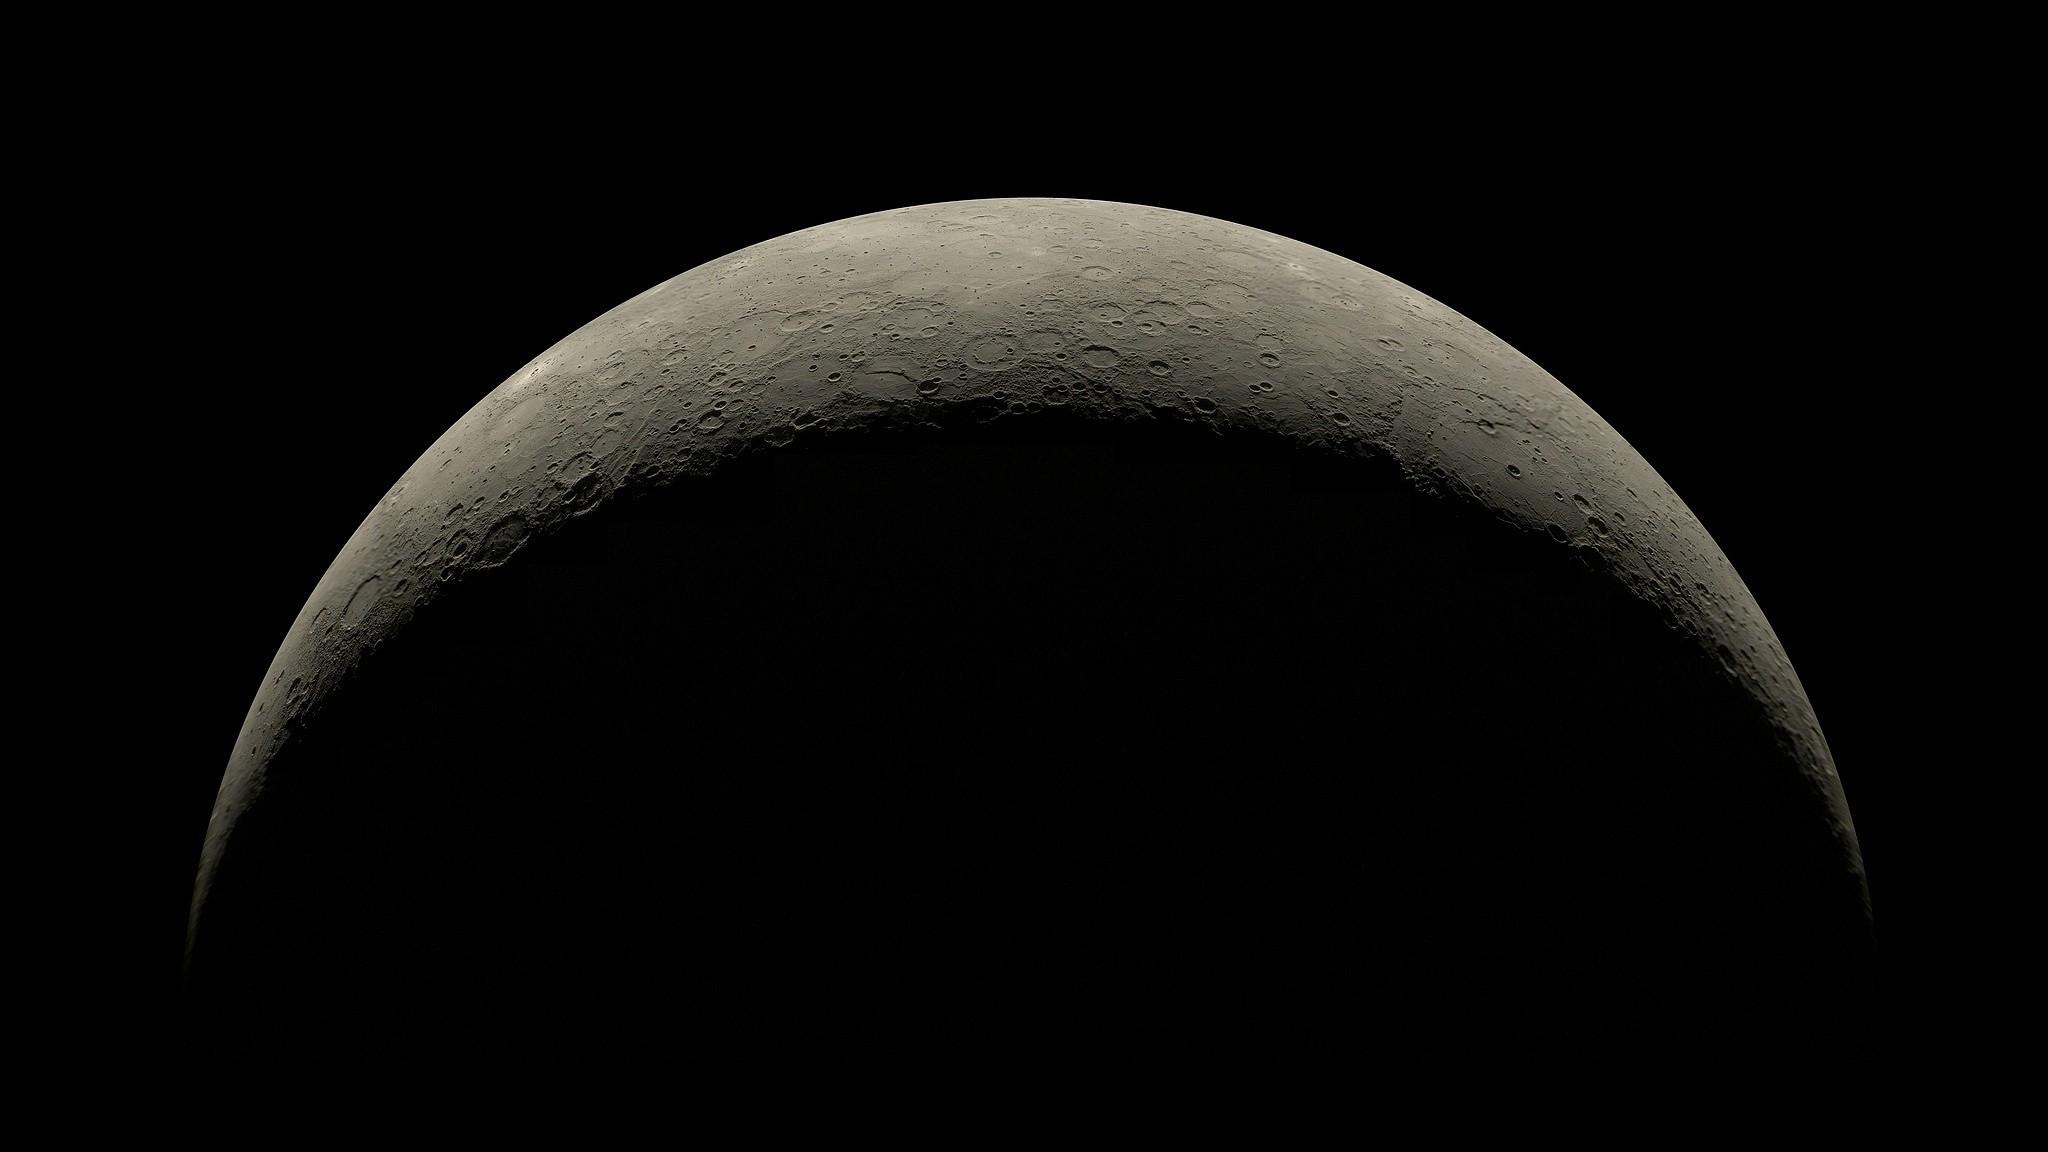 color planet mercury - HD2048×1152